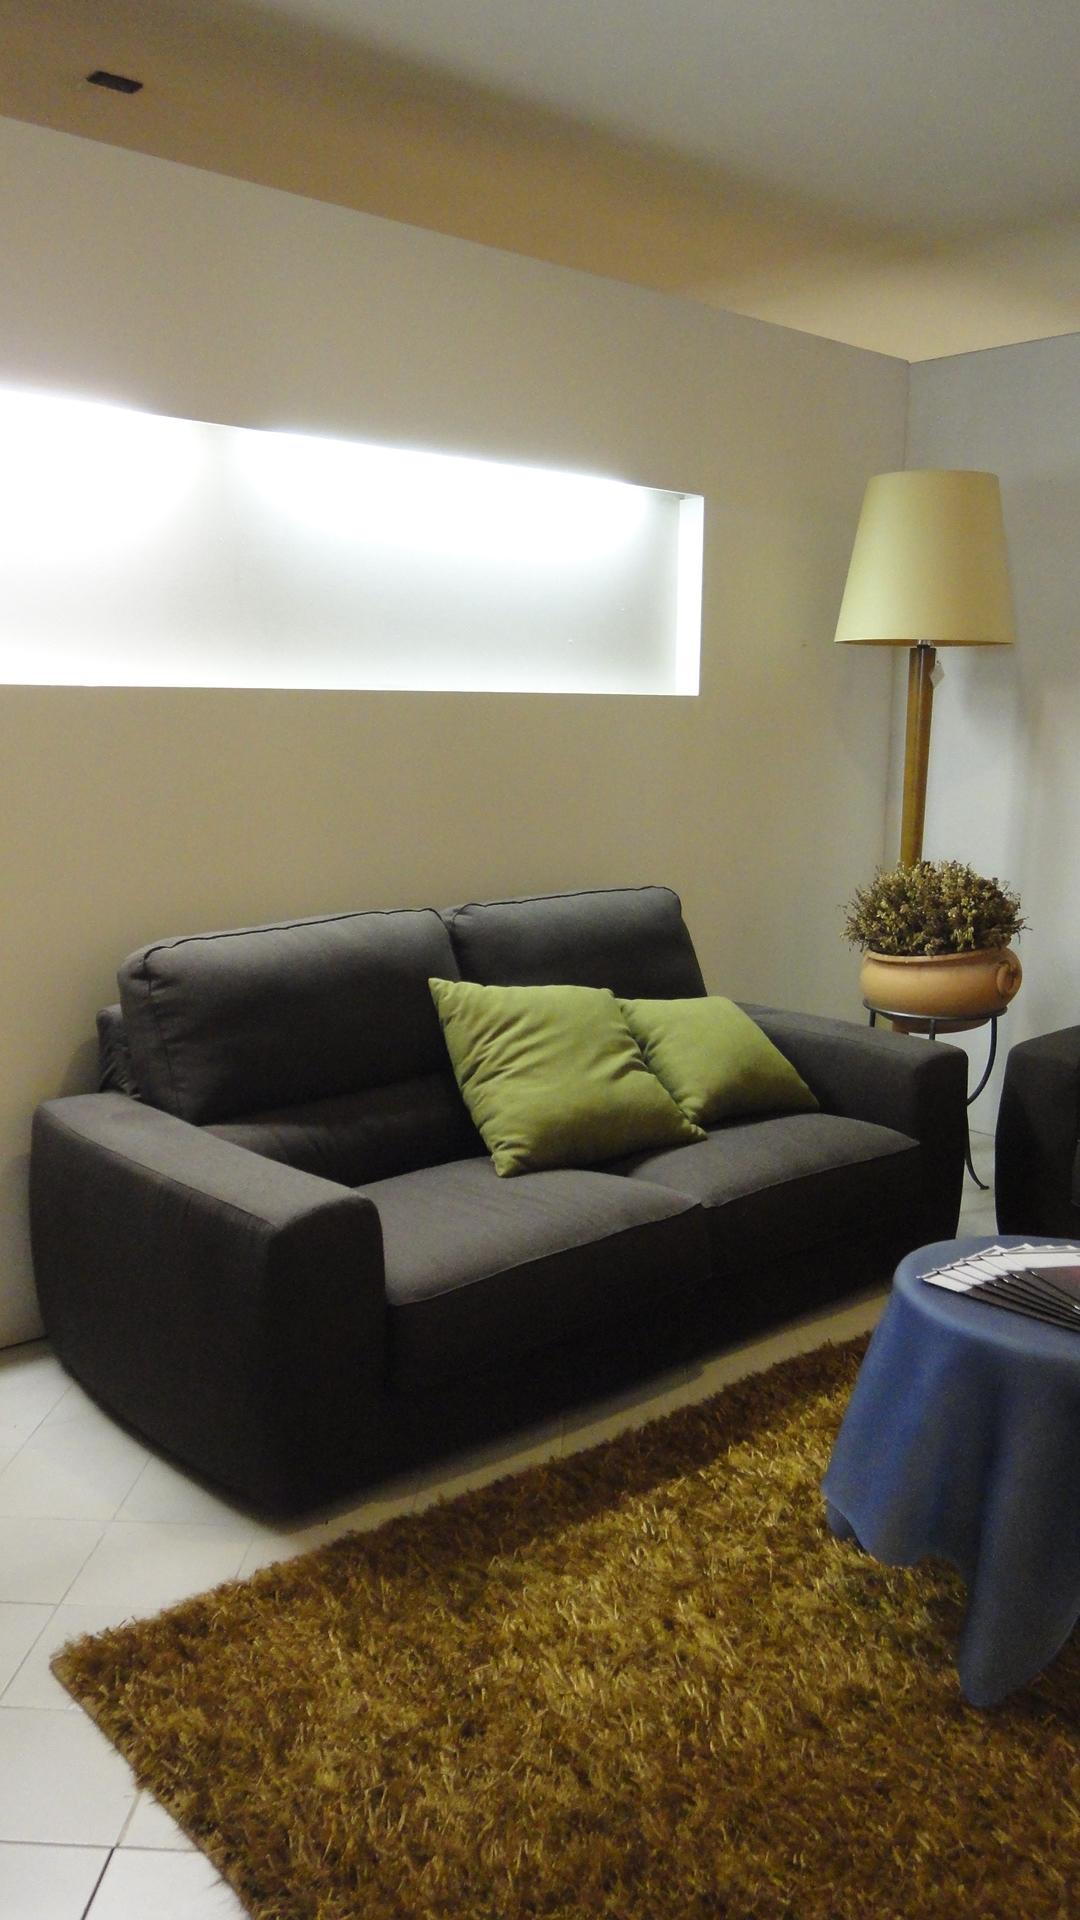 Divano lecomfort tommy divani lineari tessuto divano 4 for Divano 2 posti divani e divani